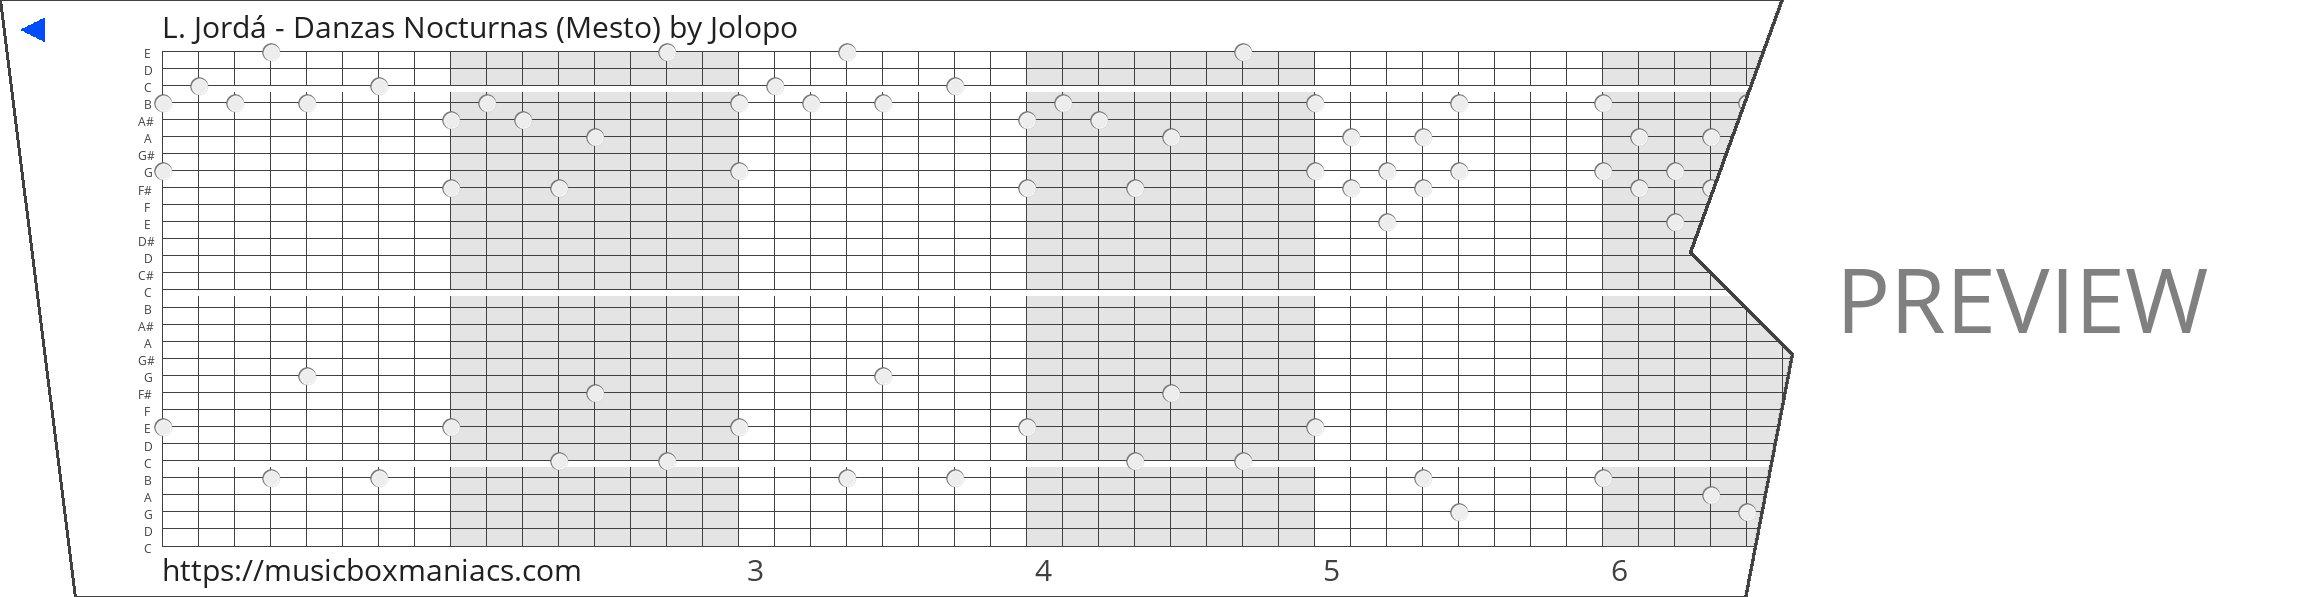 L. Jordá - Danzas Nocturnas (Mesto) 30 note music box paper strip